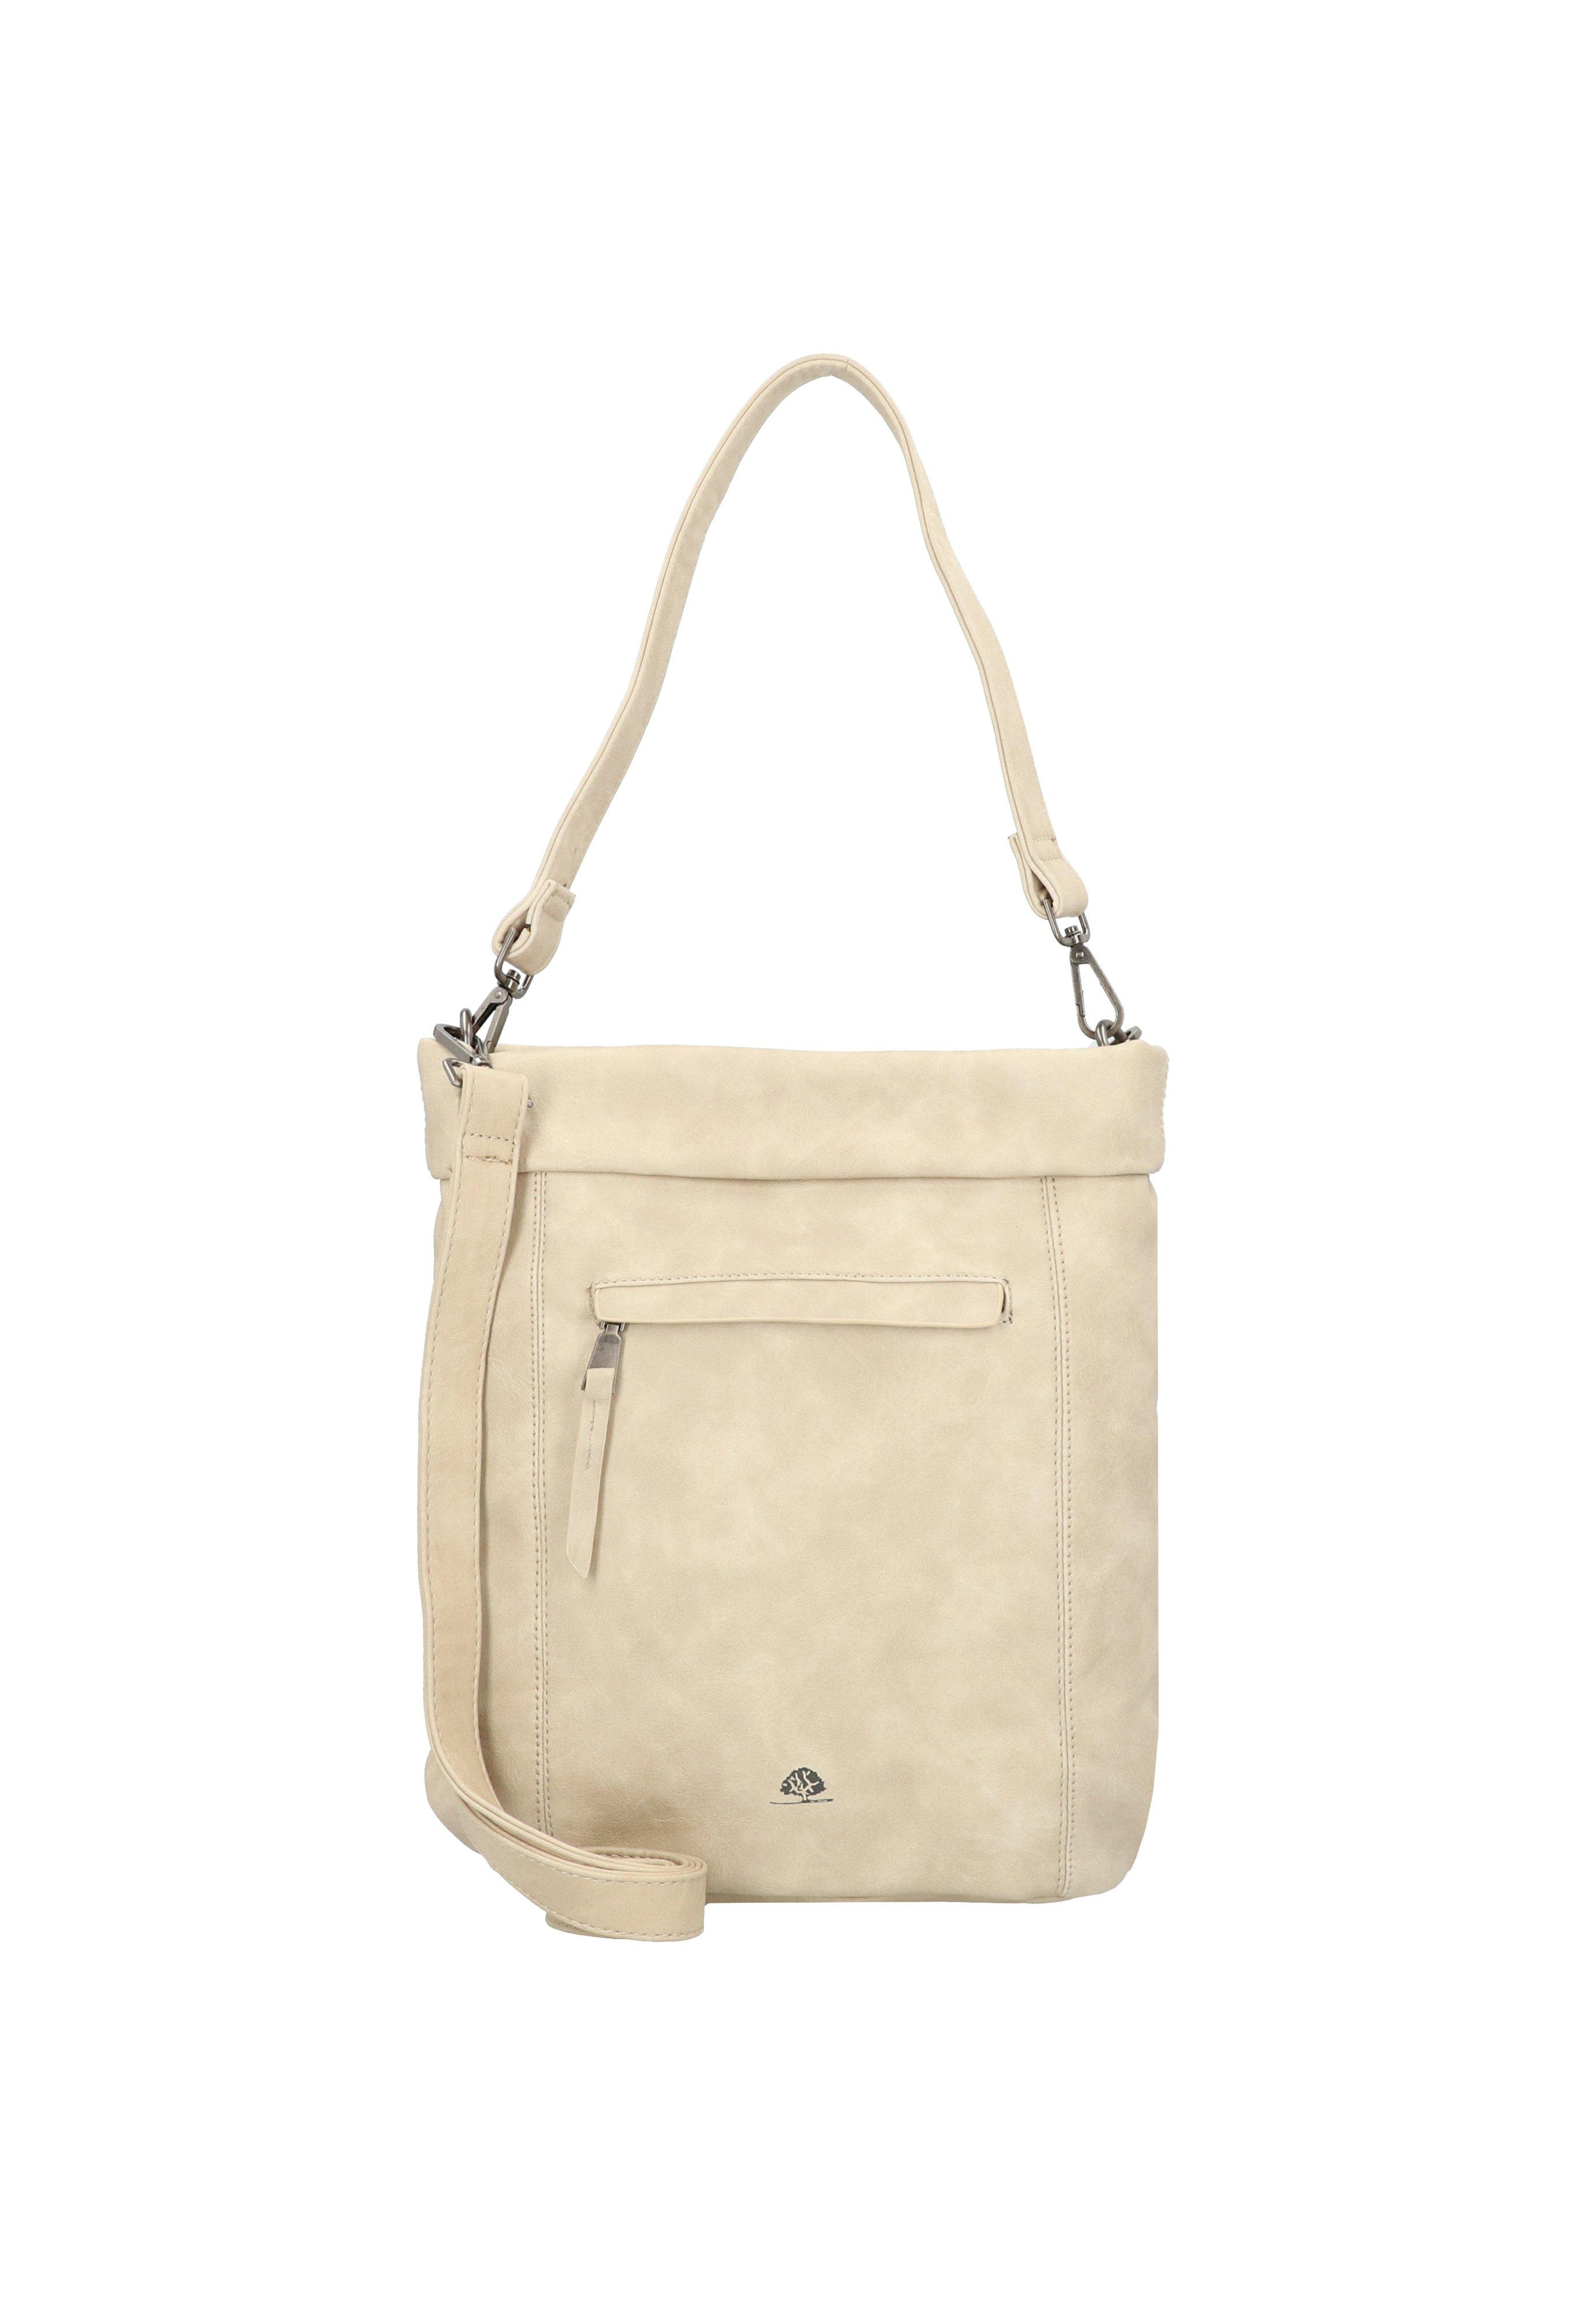 Damen LISELOTTE MAD'L DASCH - Handtasche